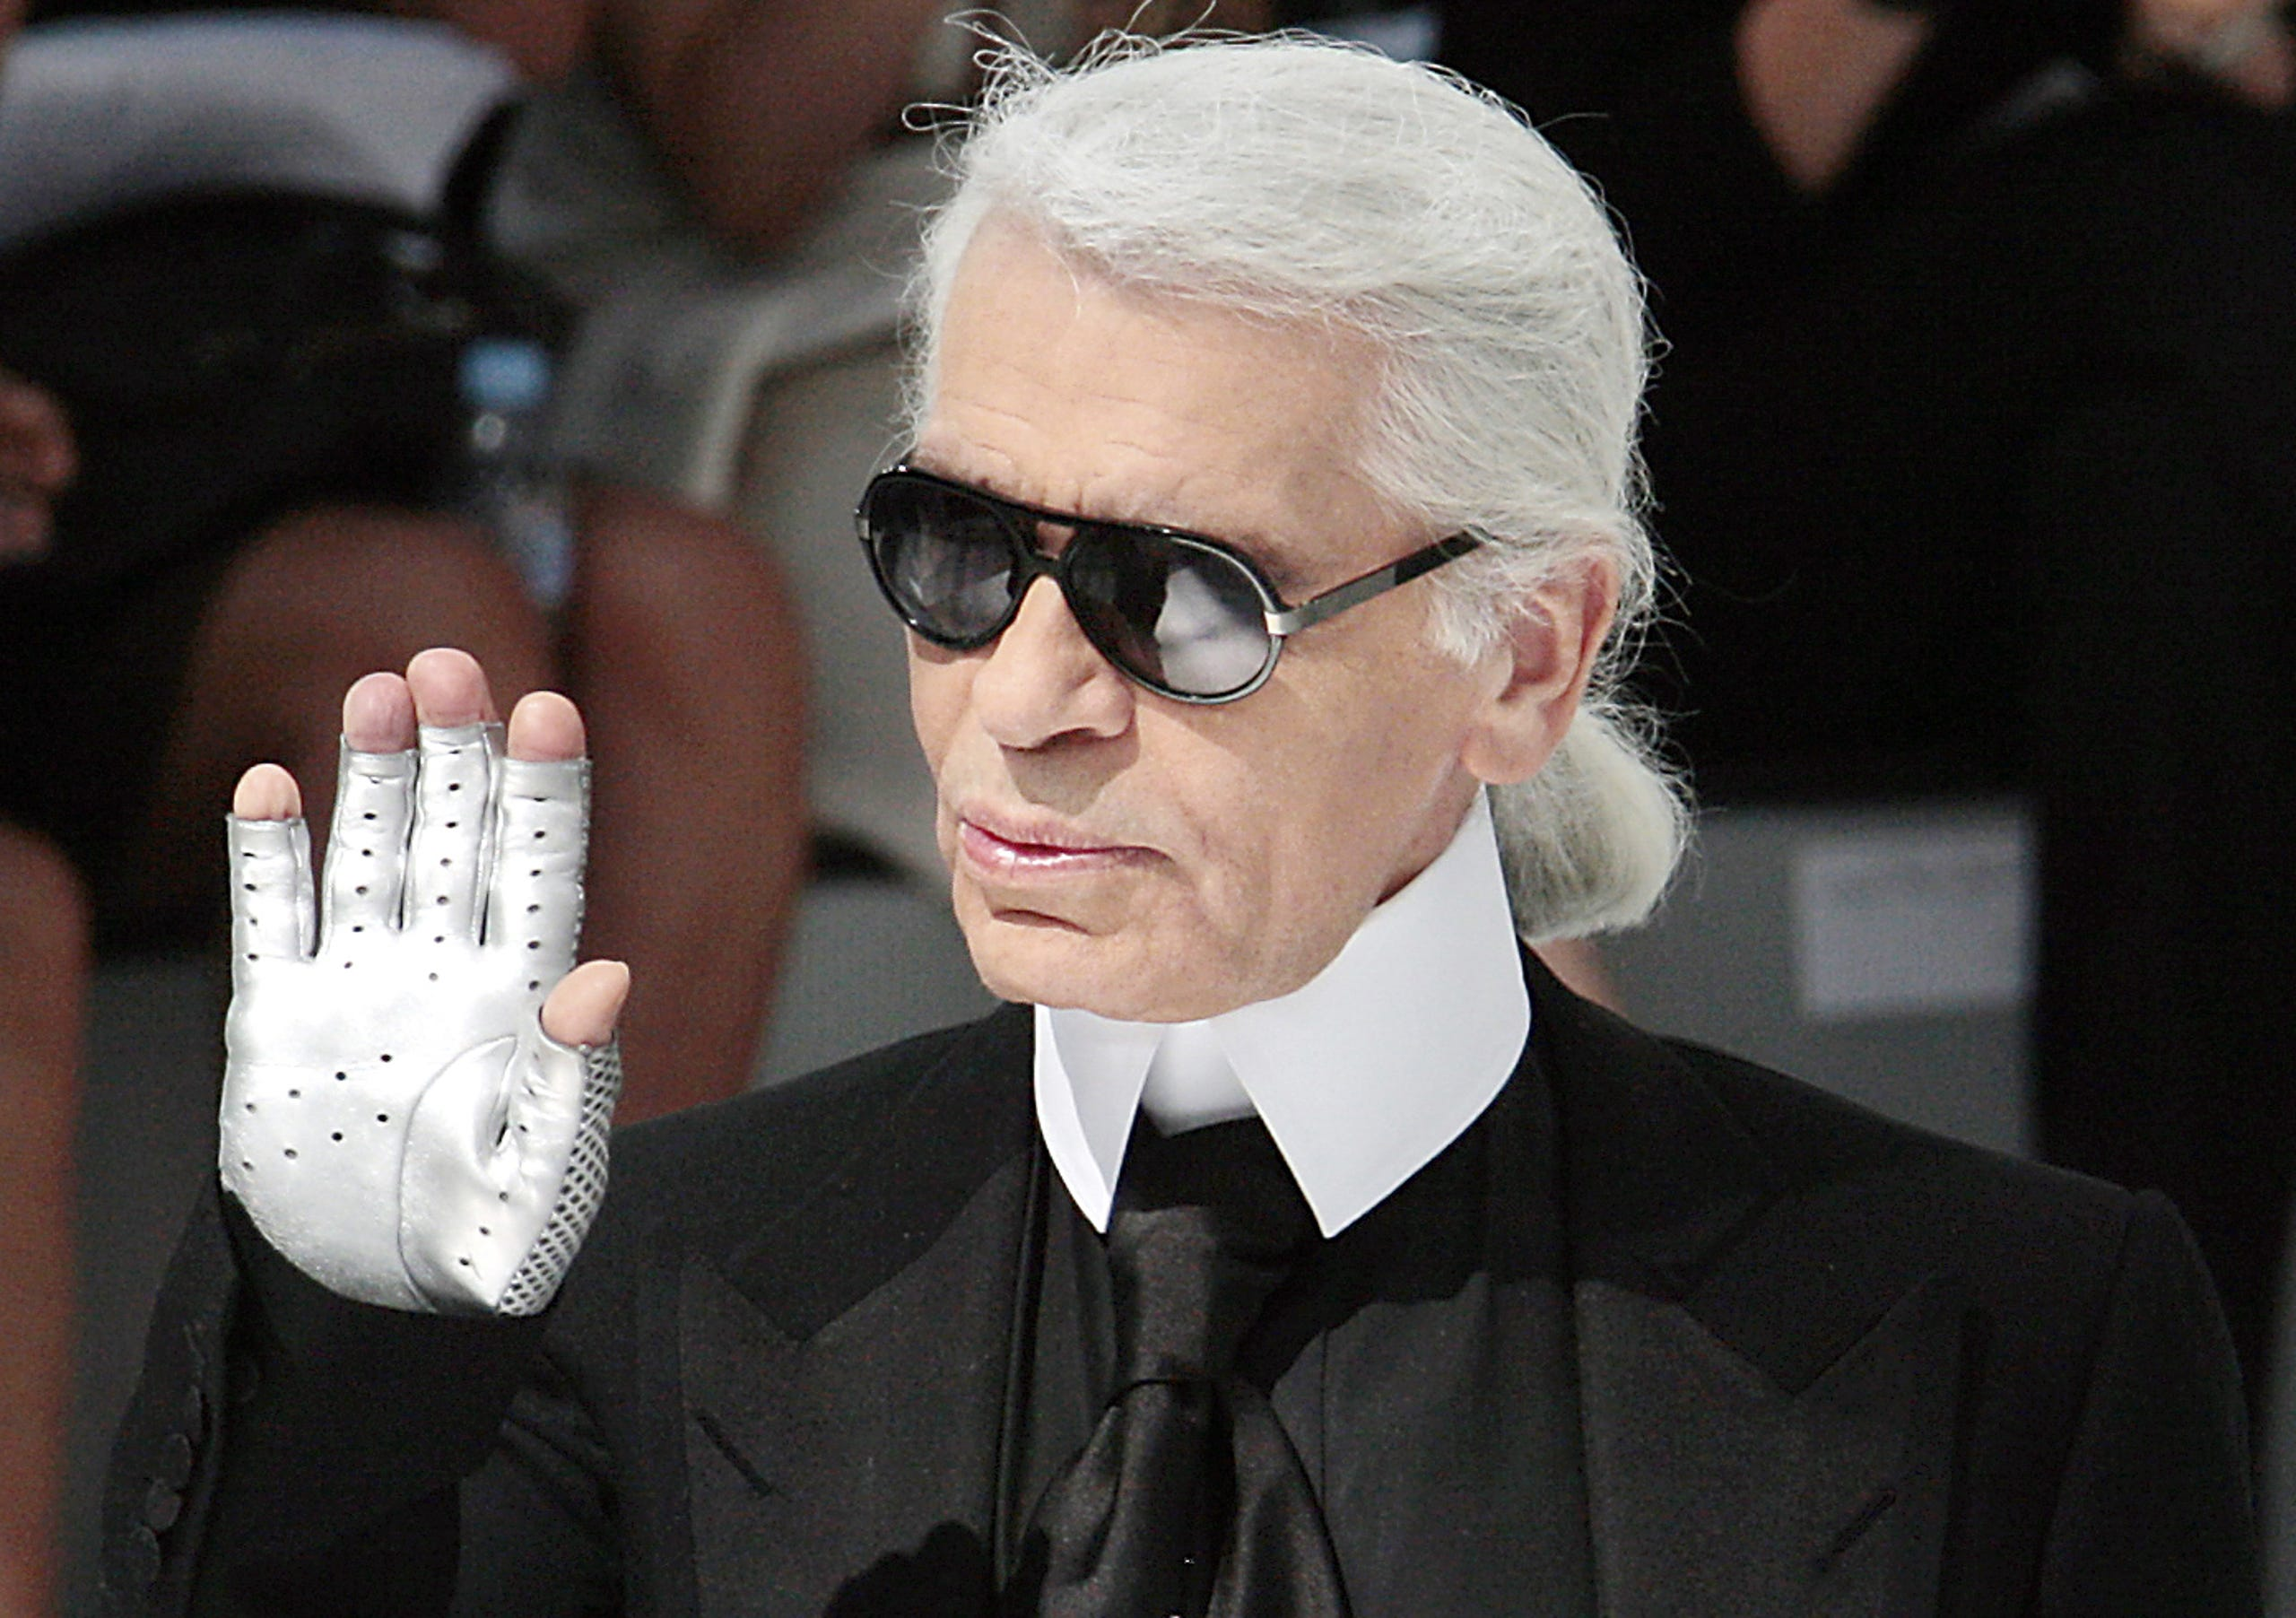 Karl Lagerfeld Iconic Fashion Designer